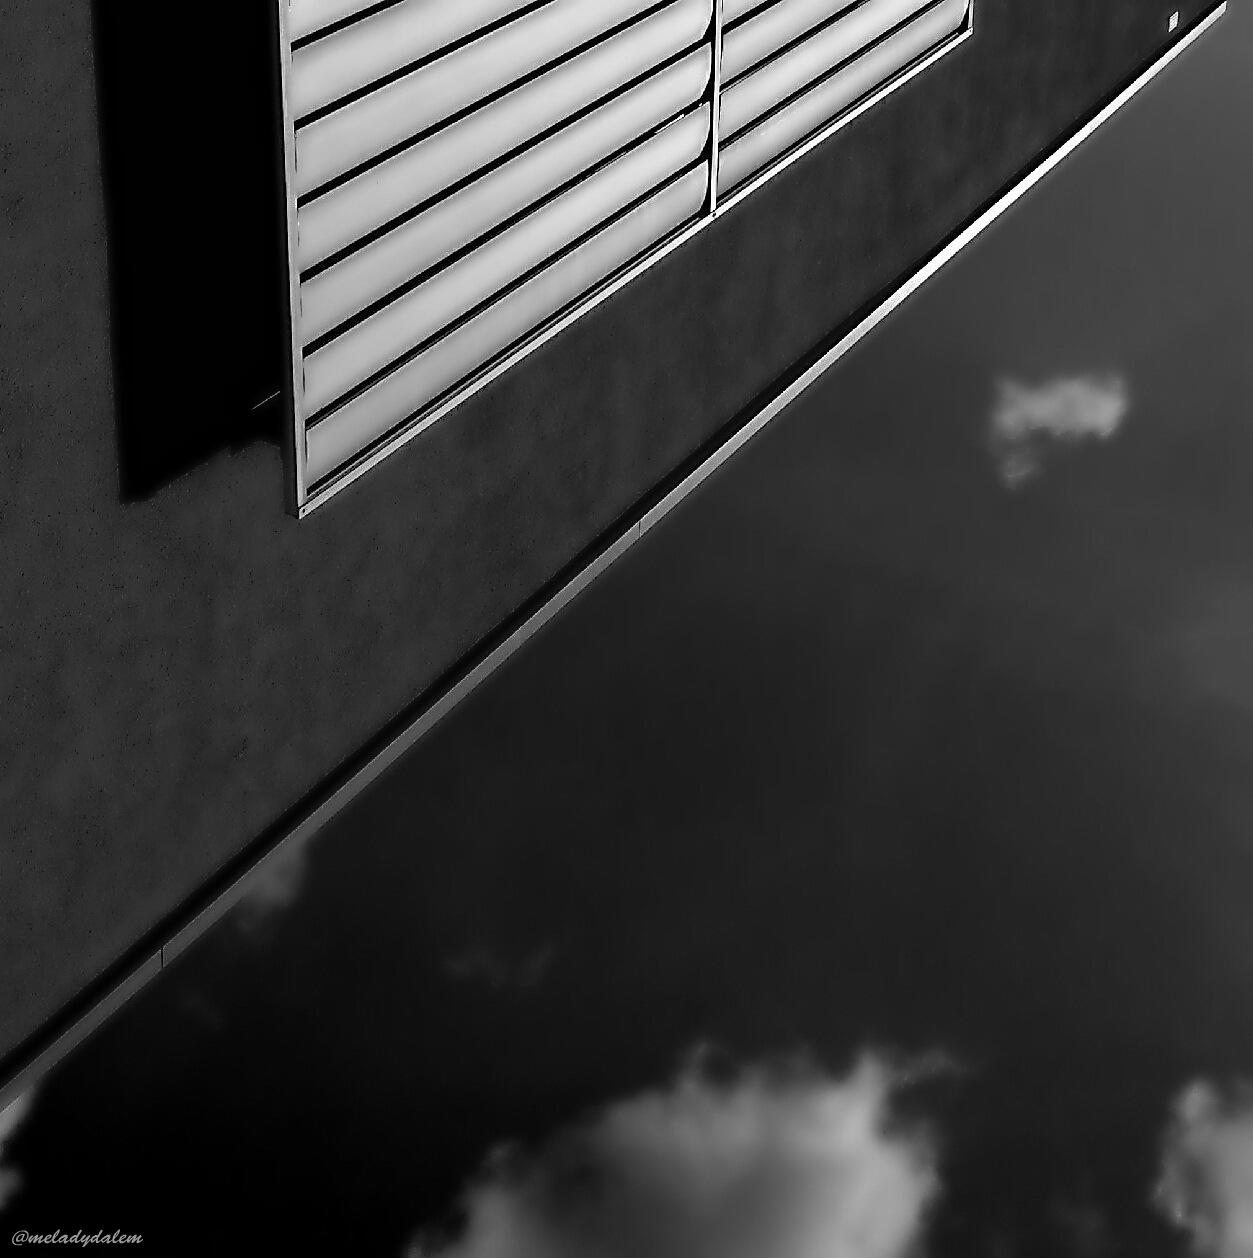 ●...diagonalHEADspin...● by meladydalem